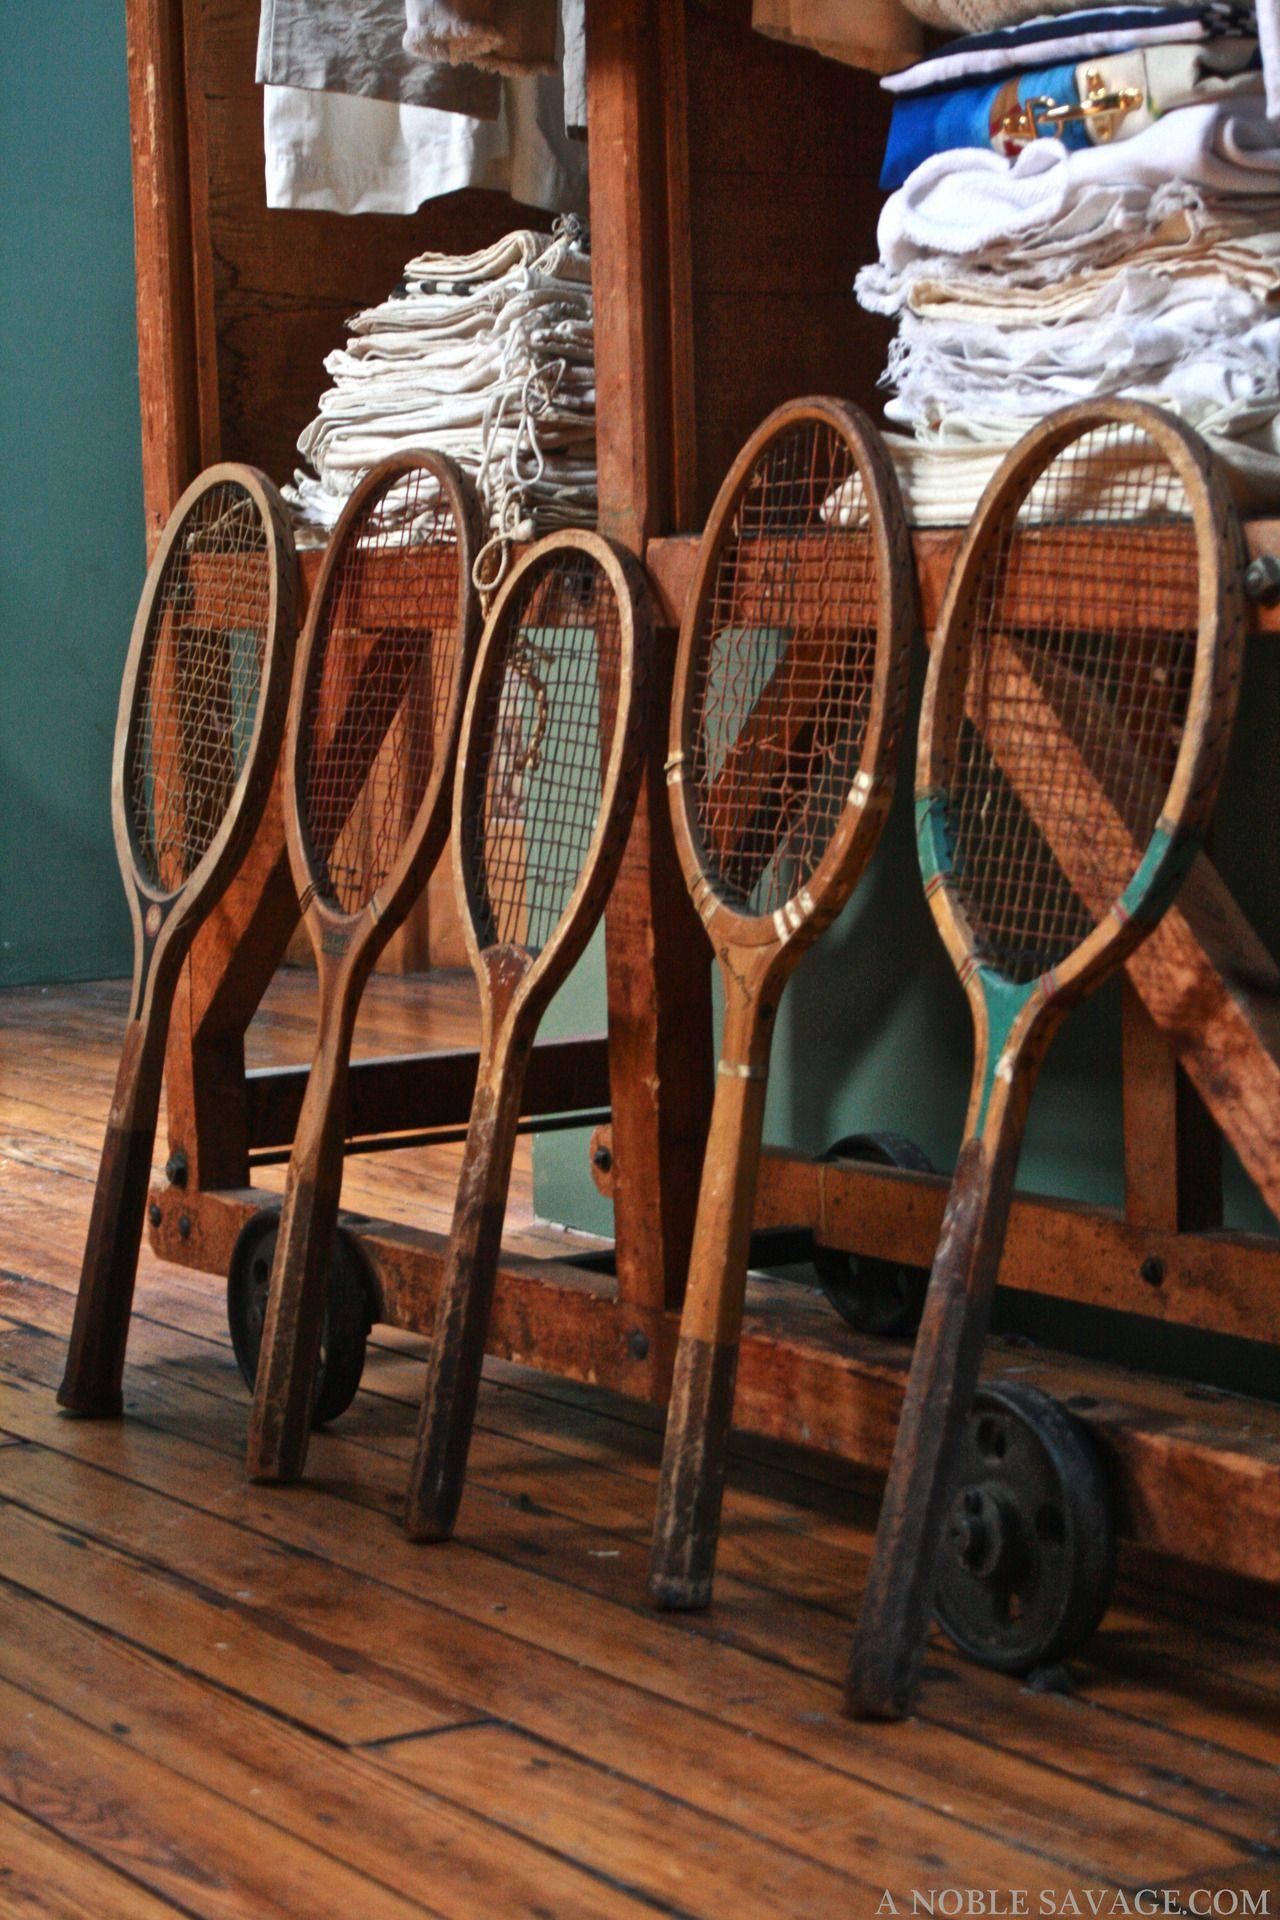 Rustic Meets Vintage Anoblesavage Art Direction Photography By Ali Vintage Tennis Tennis Art Sport Tennis